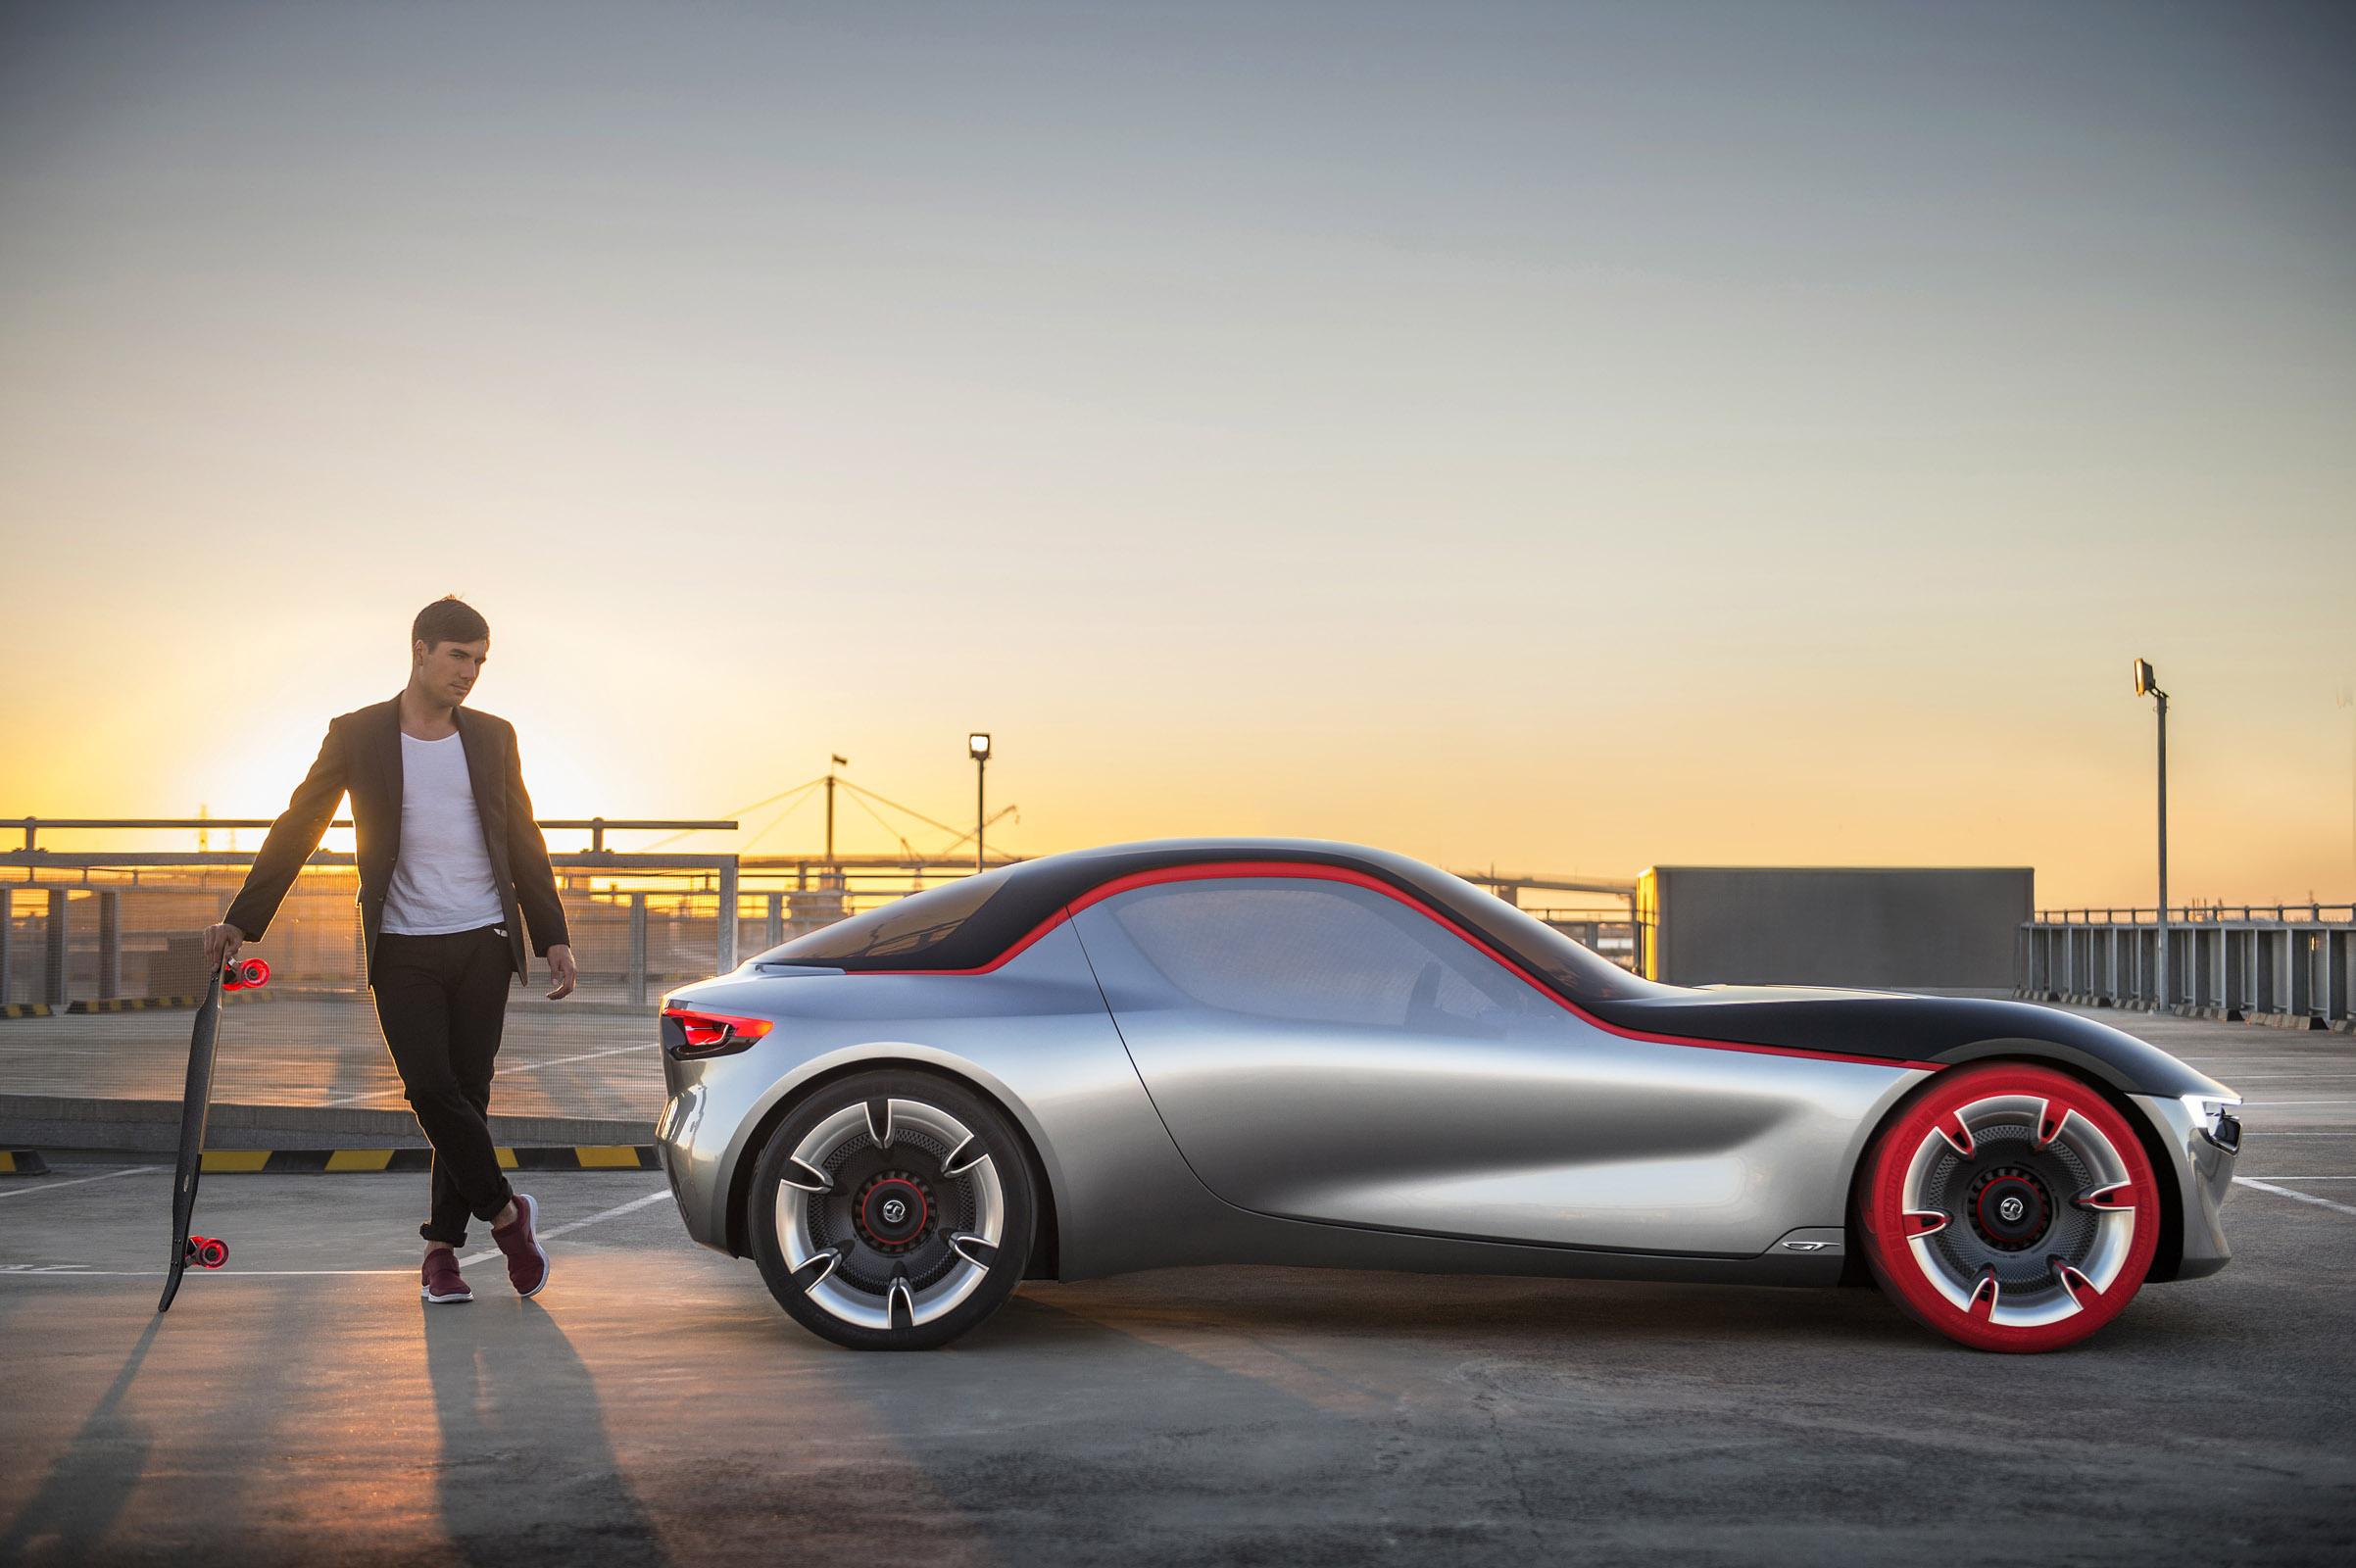 2016 Vauxhall GT Concept